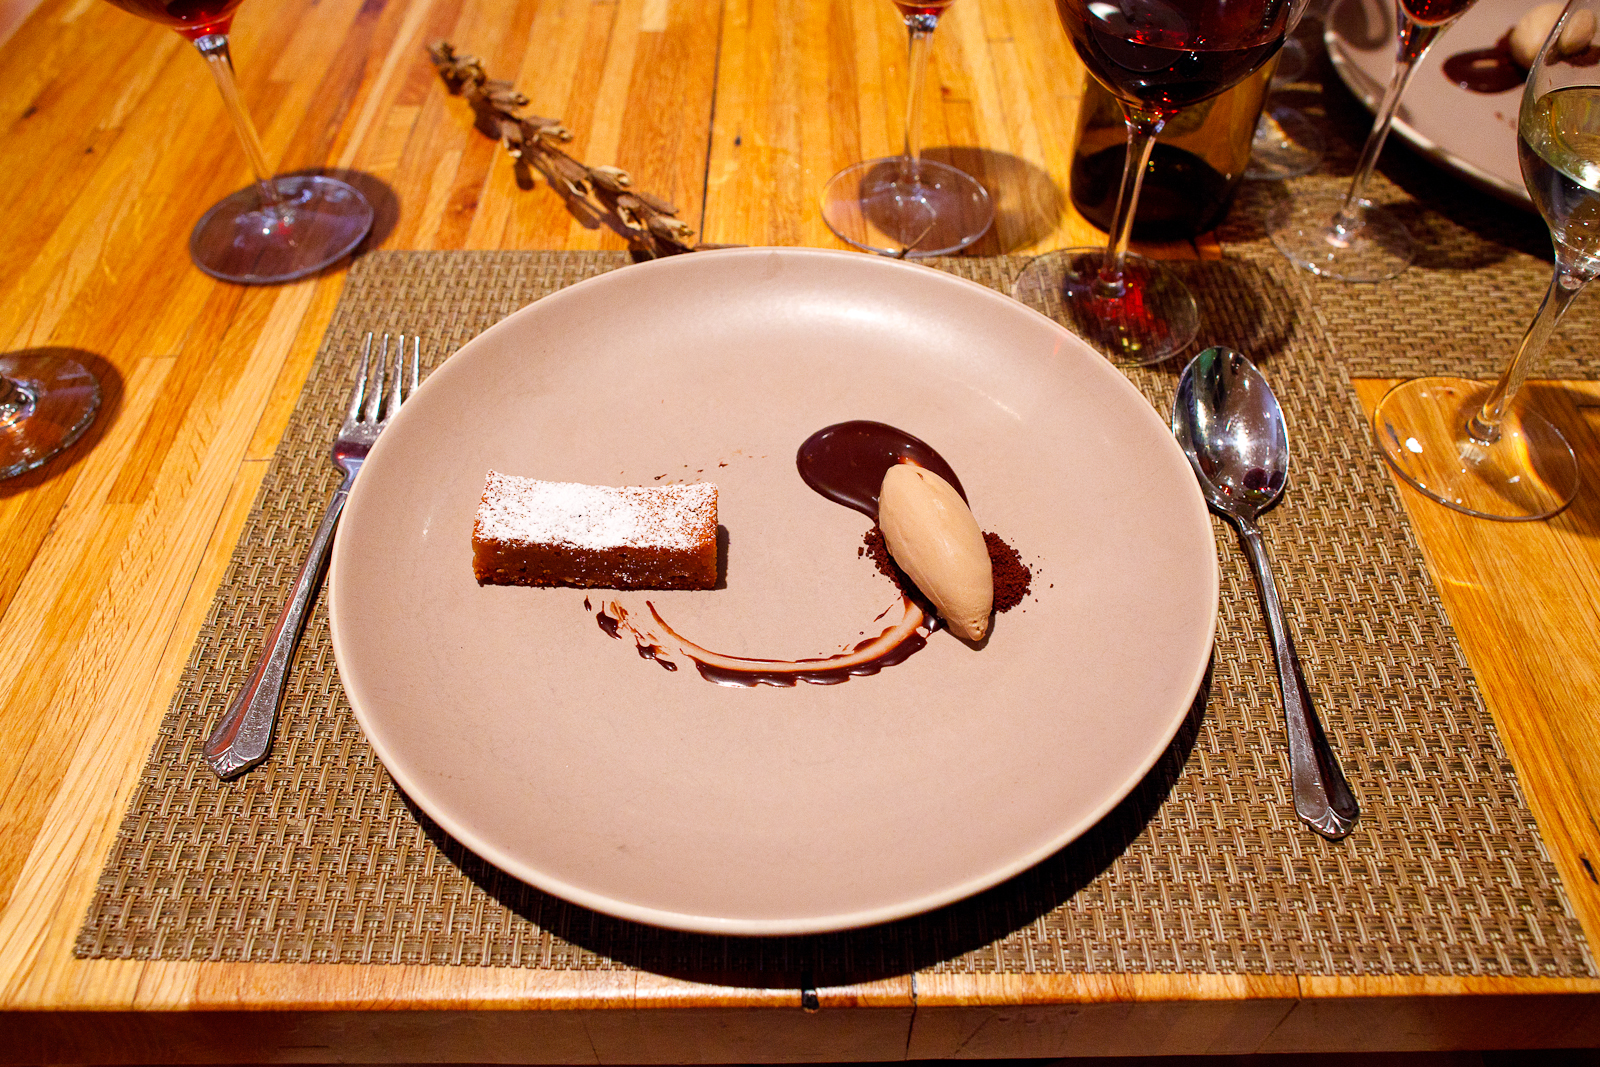 10th Course: Peanut butter pie